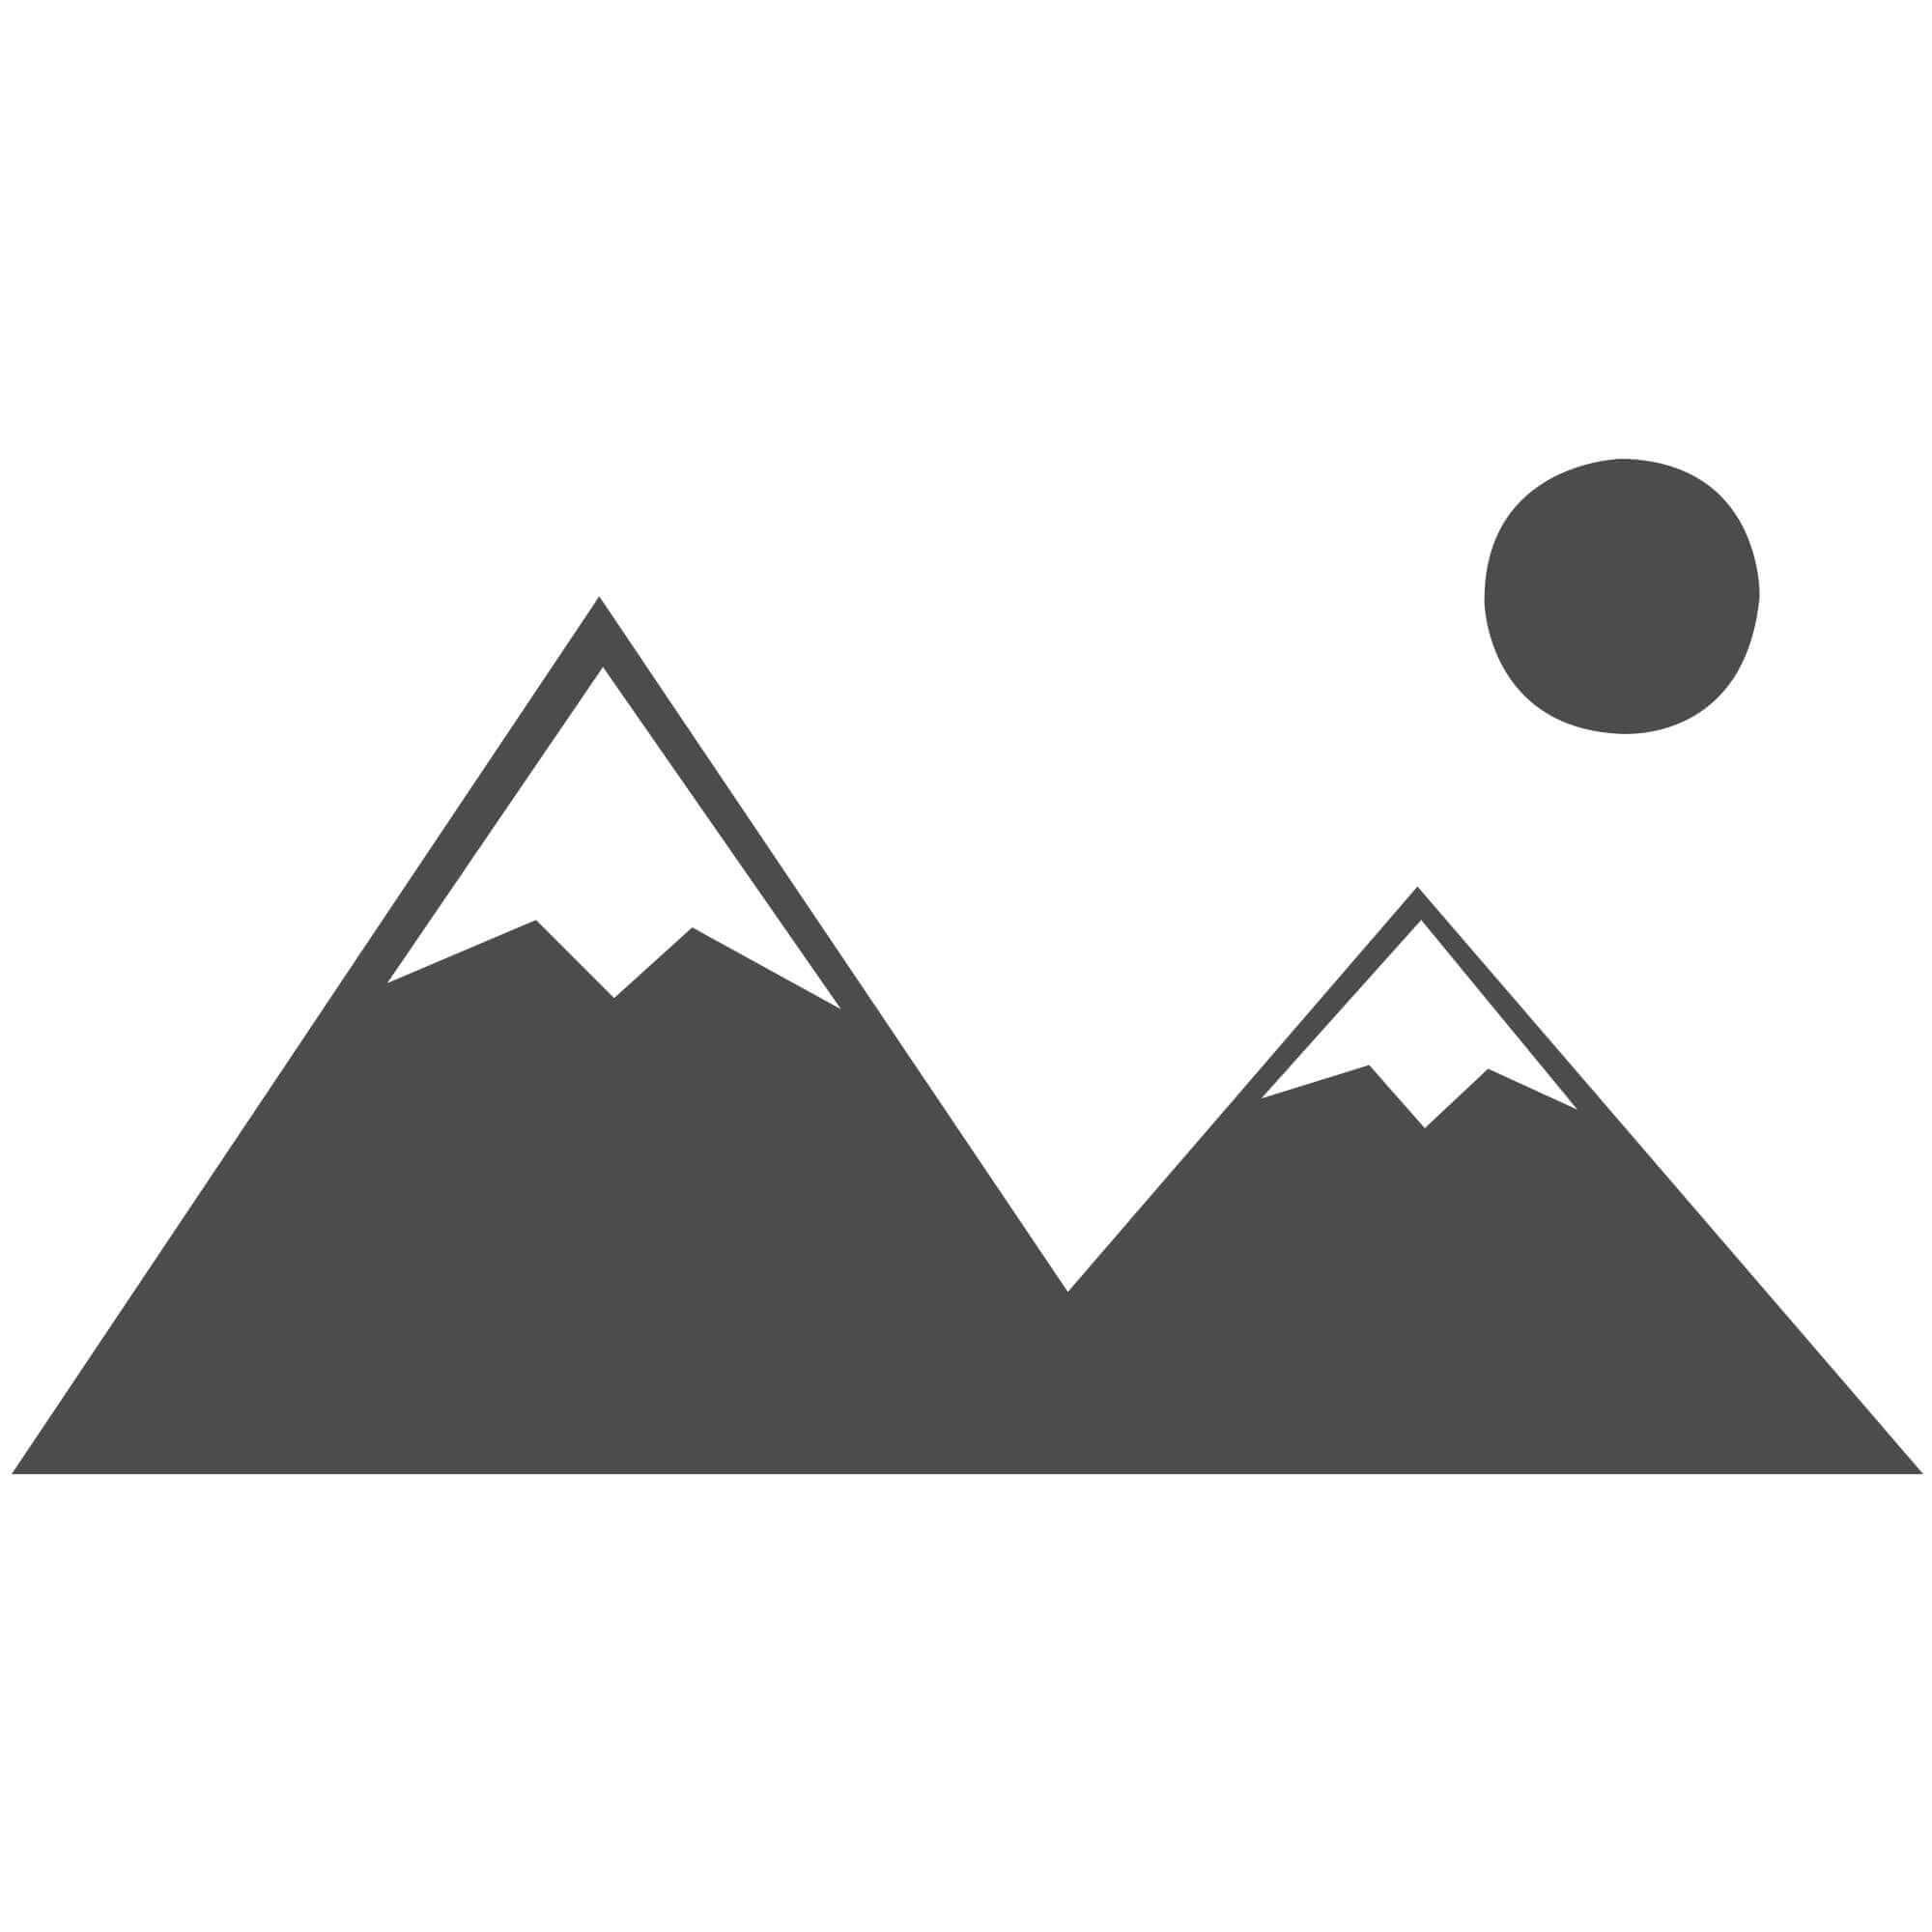 Vertical mill drill vmd 45g baileigh industrial for Golf mill motor sales